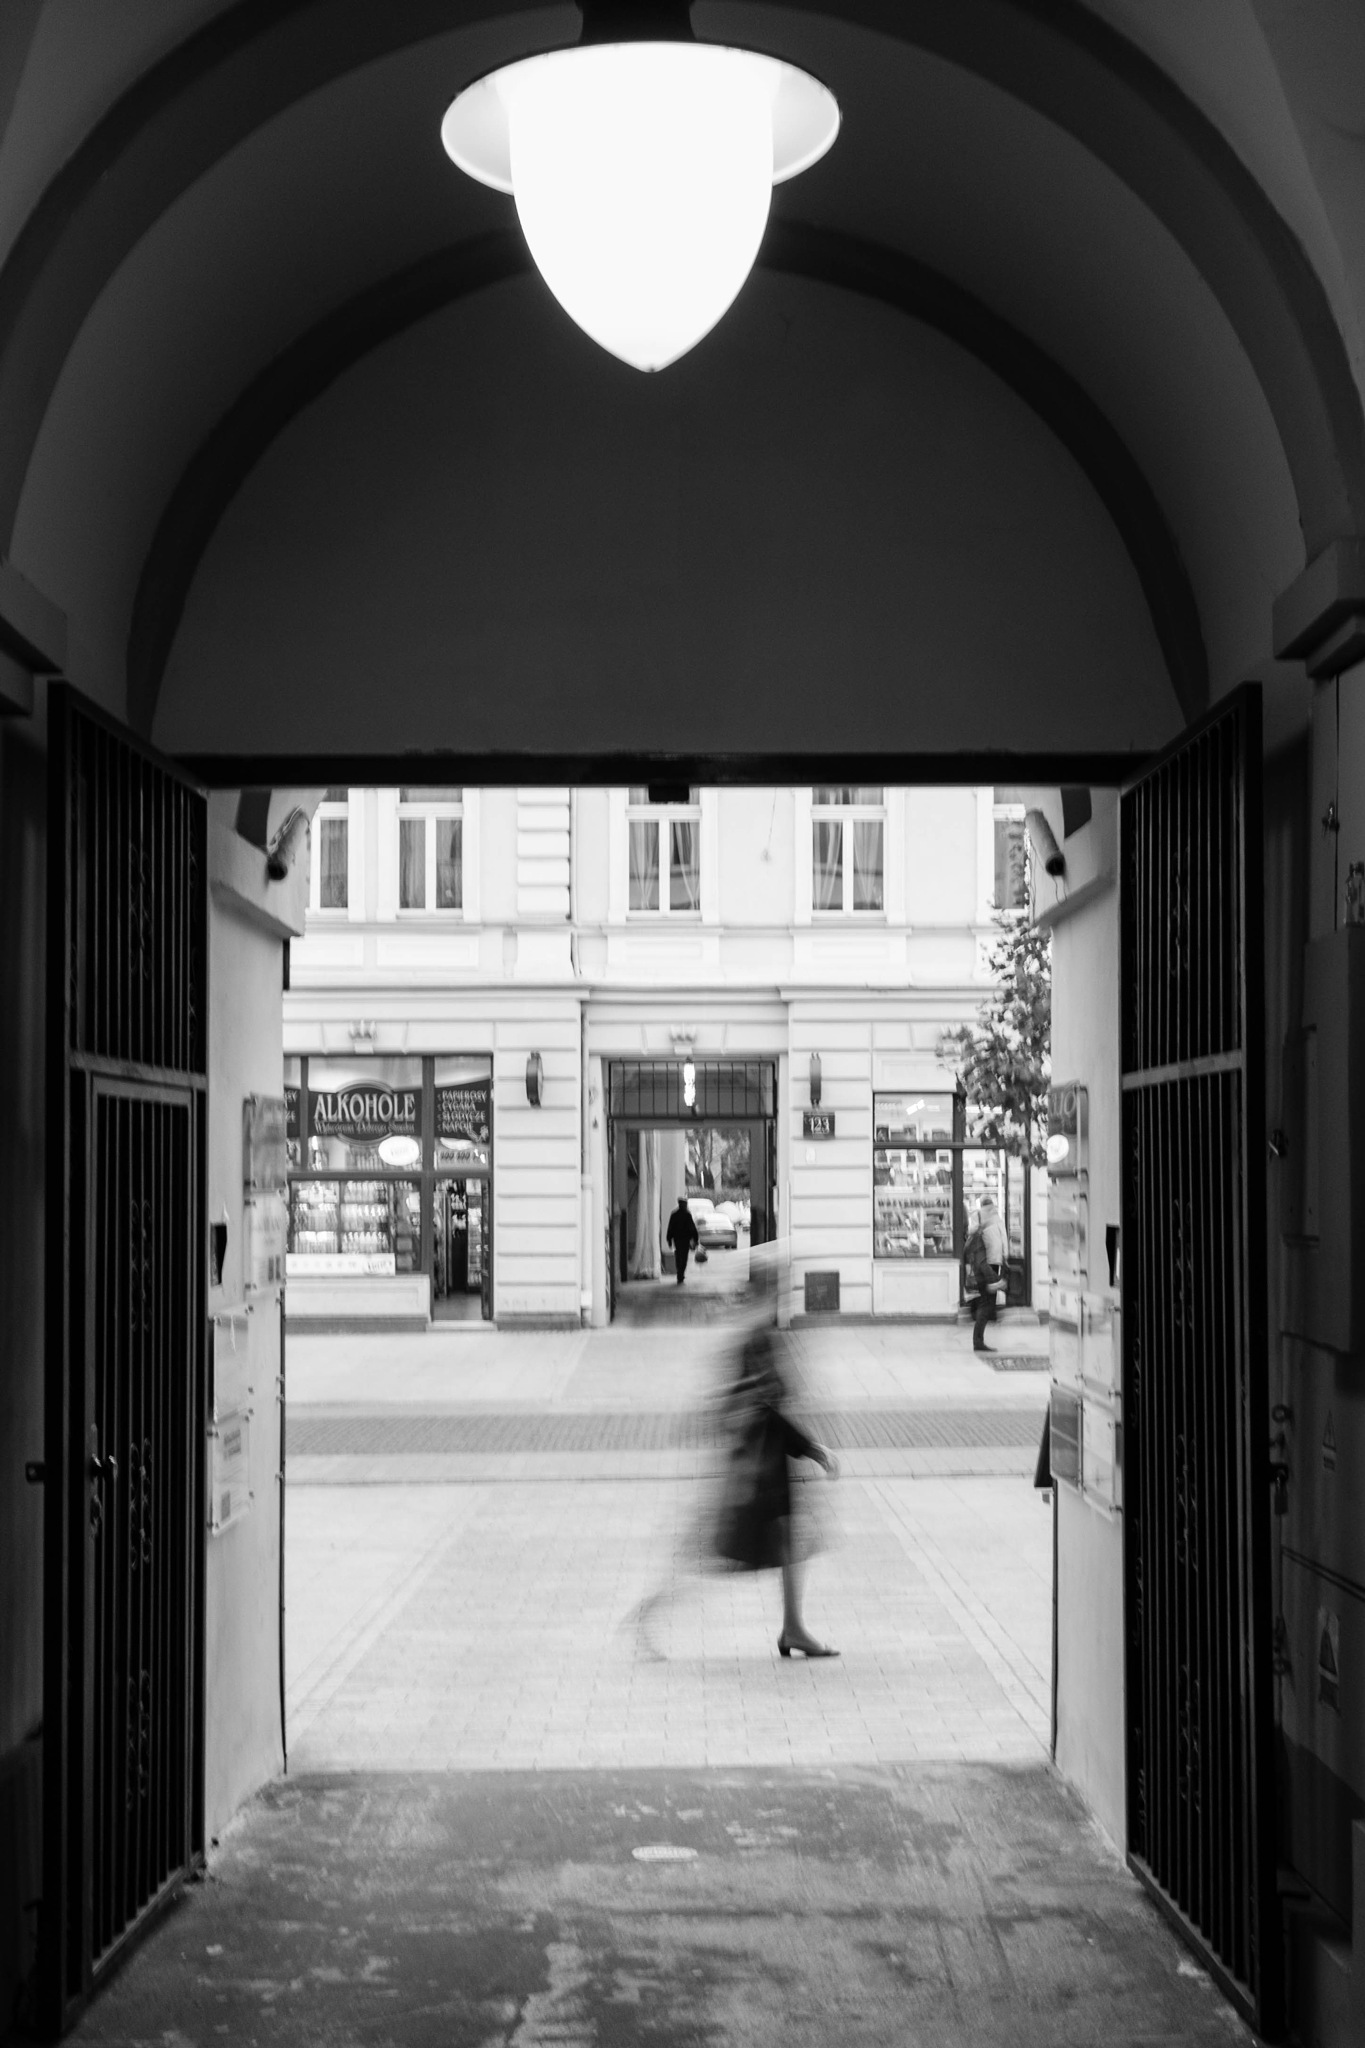 Piotrkowska Alleyway by DRJonsey